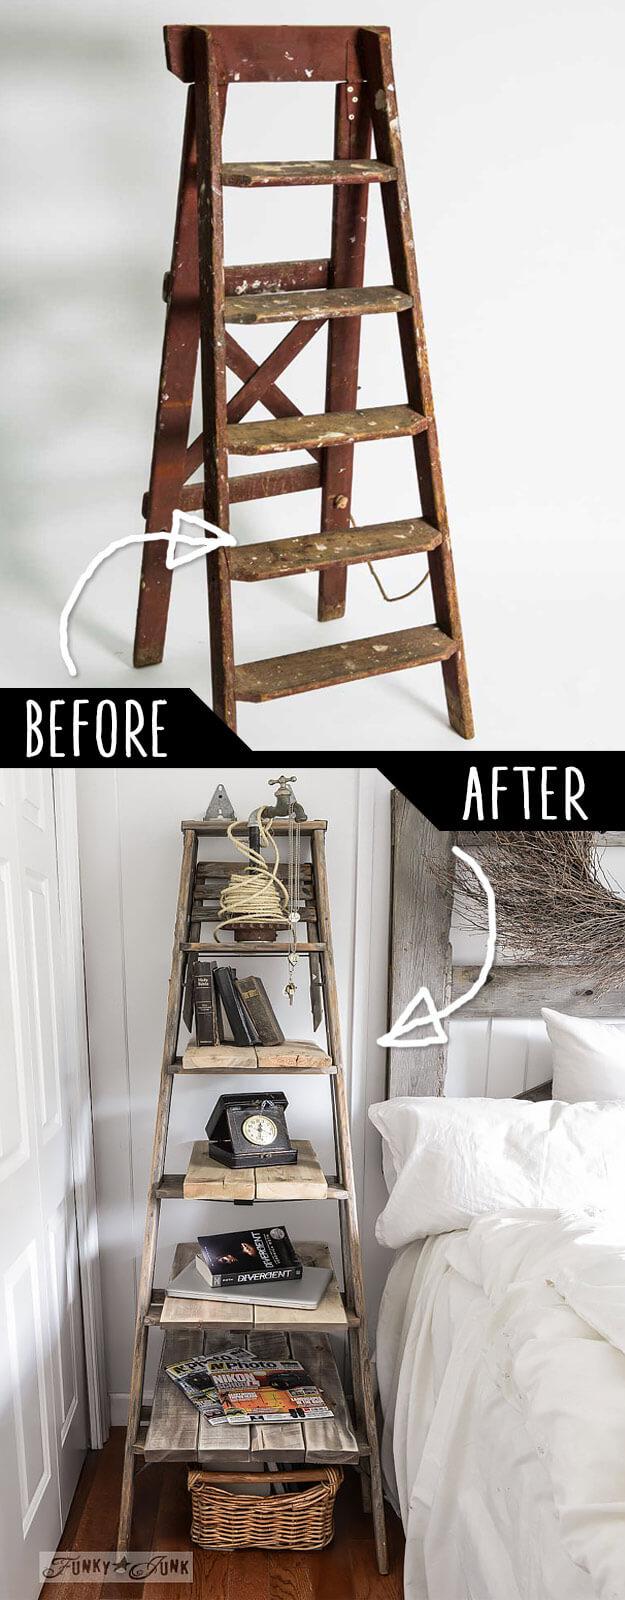 Workman's Bedside DIY Vintage Décor